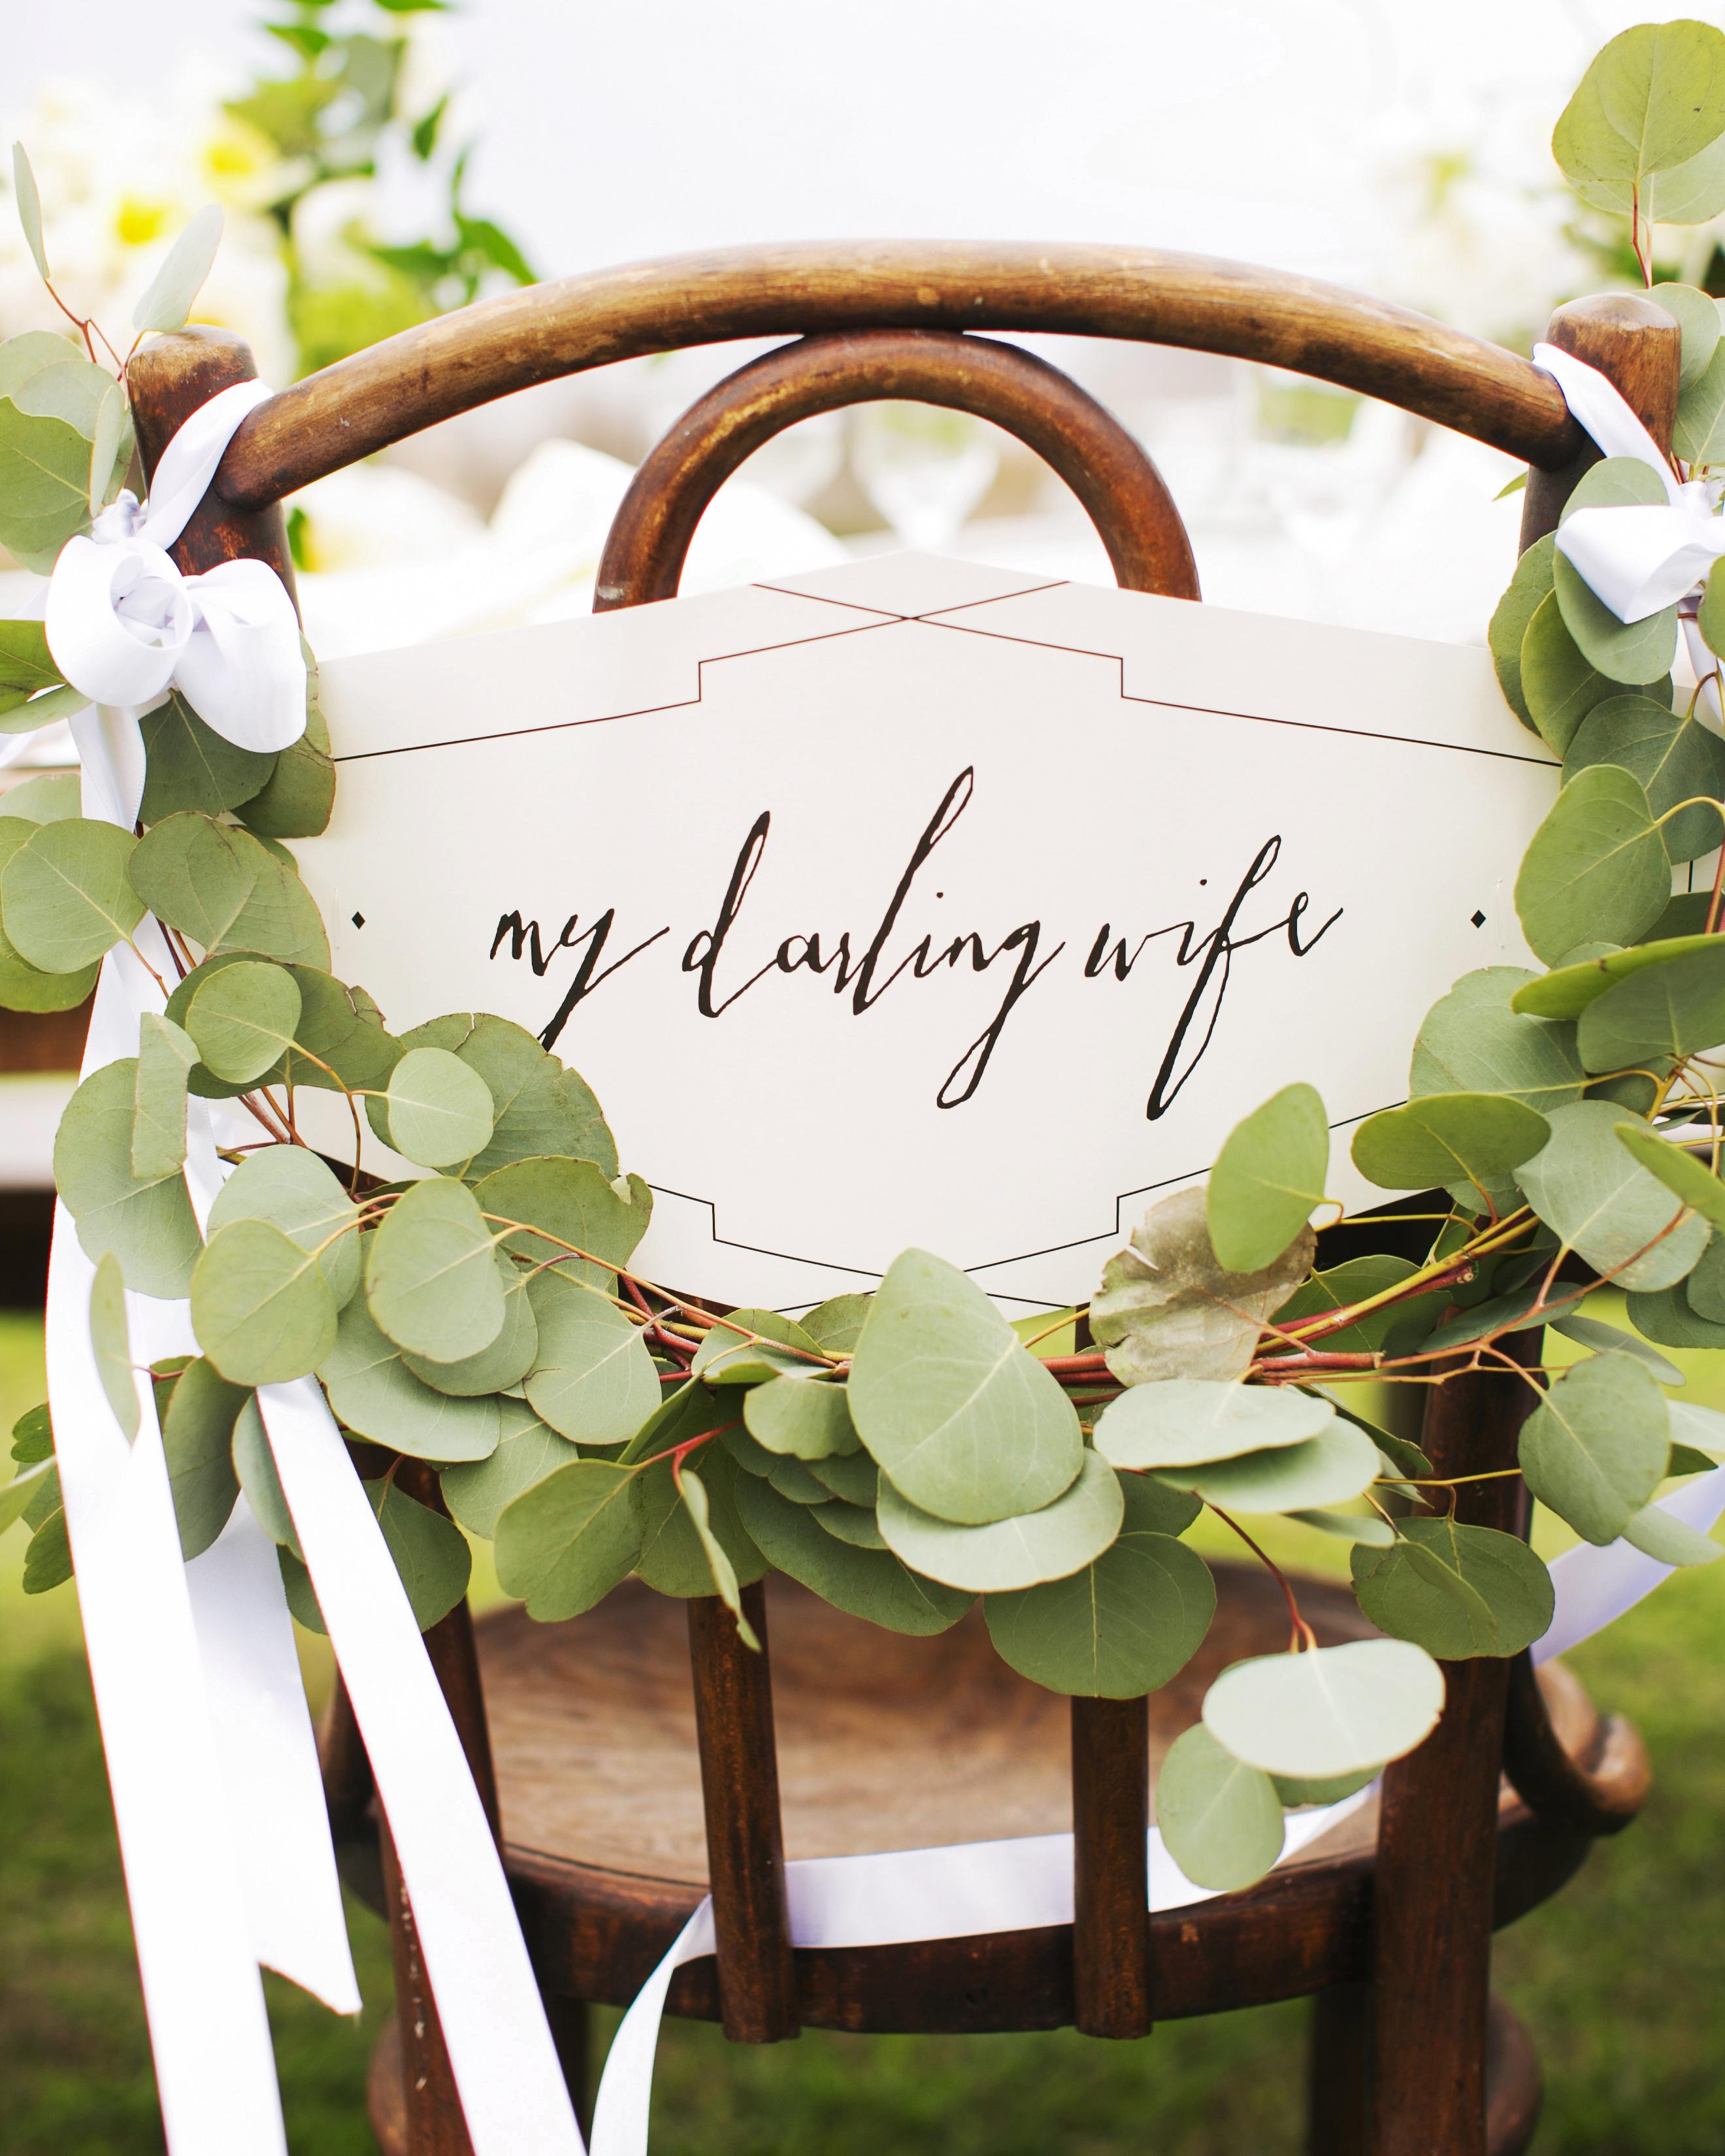 eucalyptus wrap wood chair darling wife sign